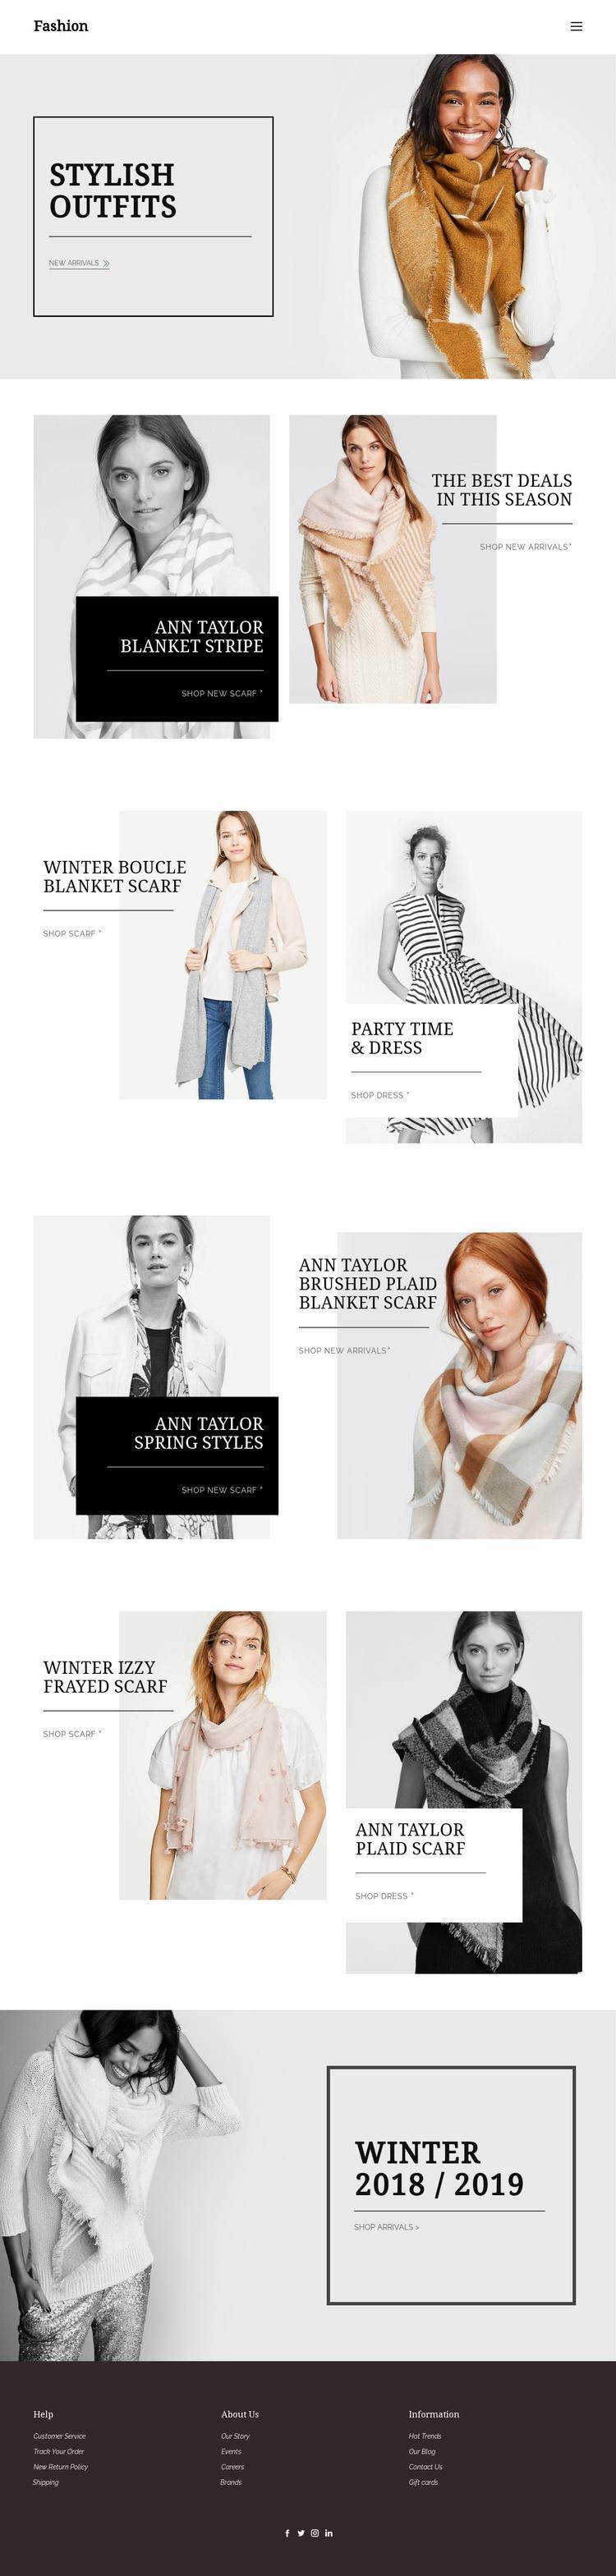 Personal shopper service Landing Page